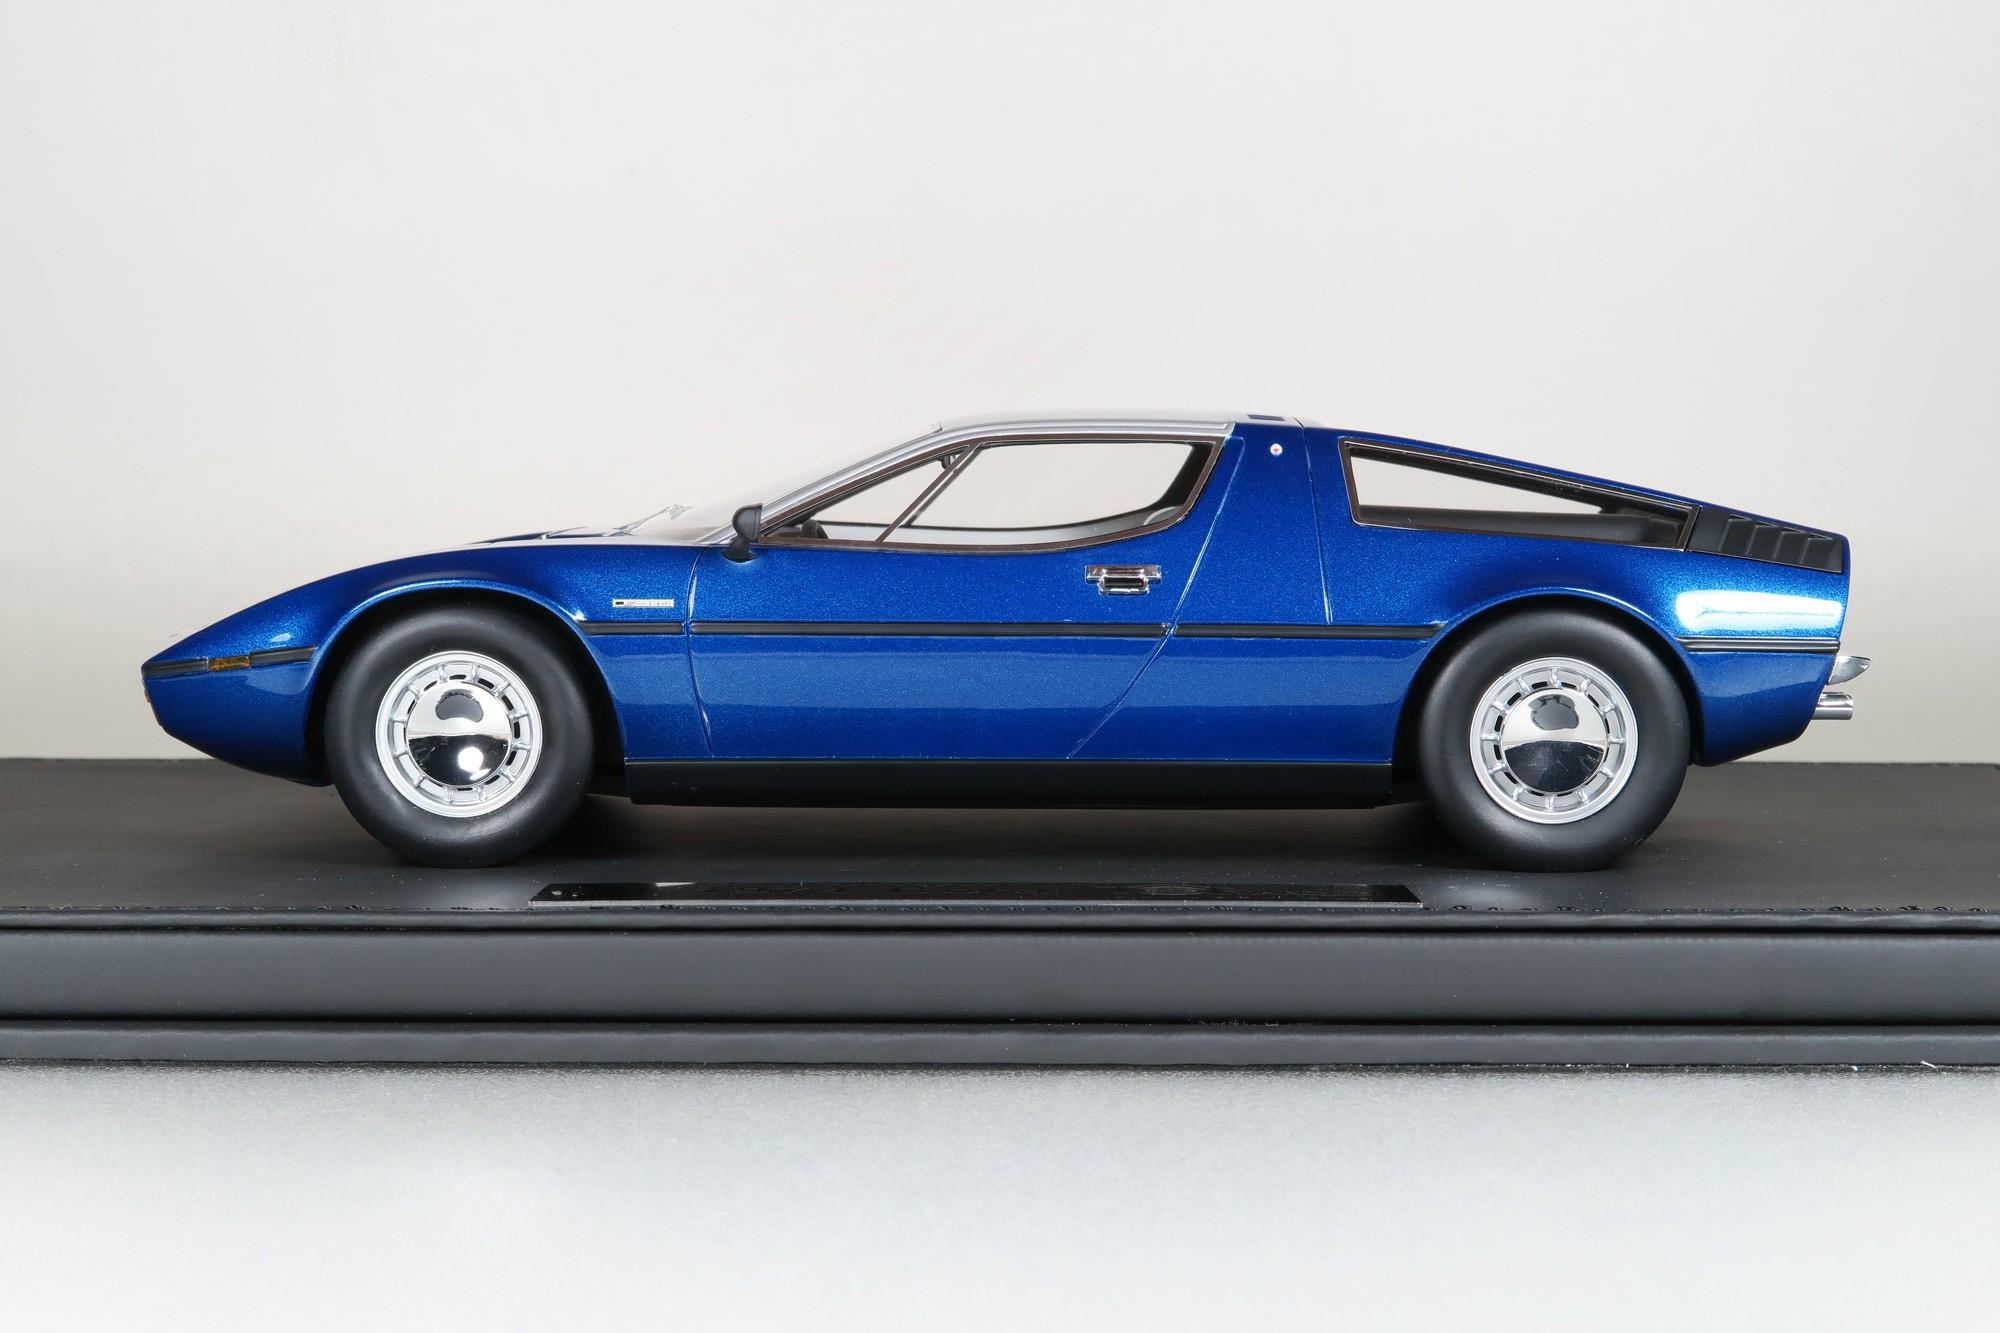 Top Marques Collectibles Maserati Bora 1 18 Blau Top25b